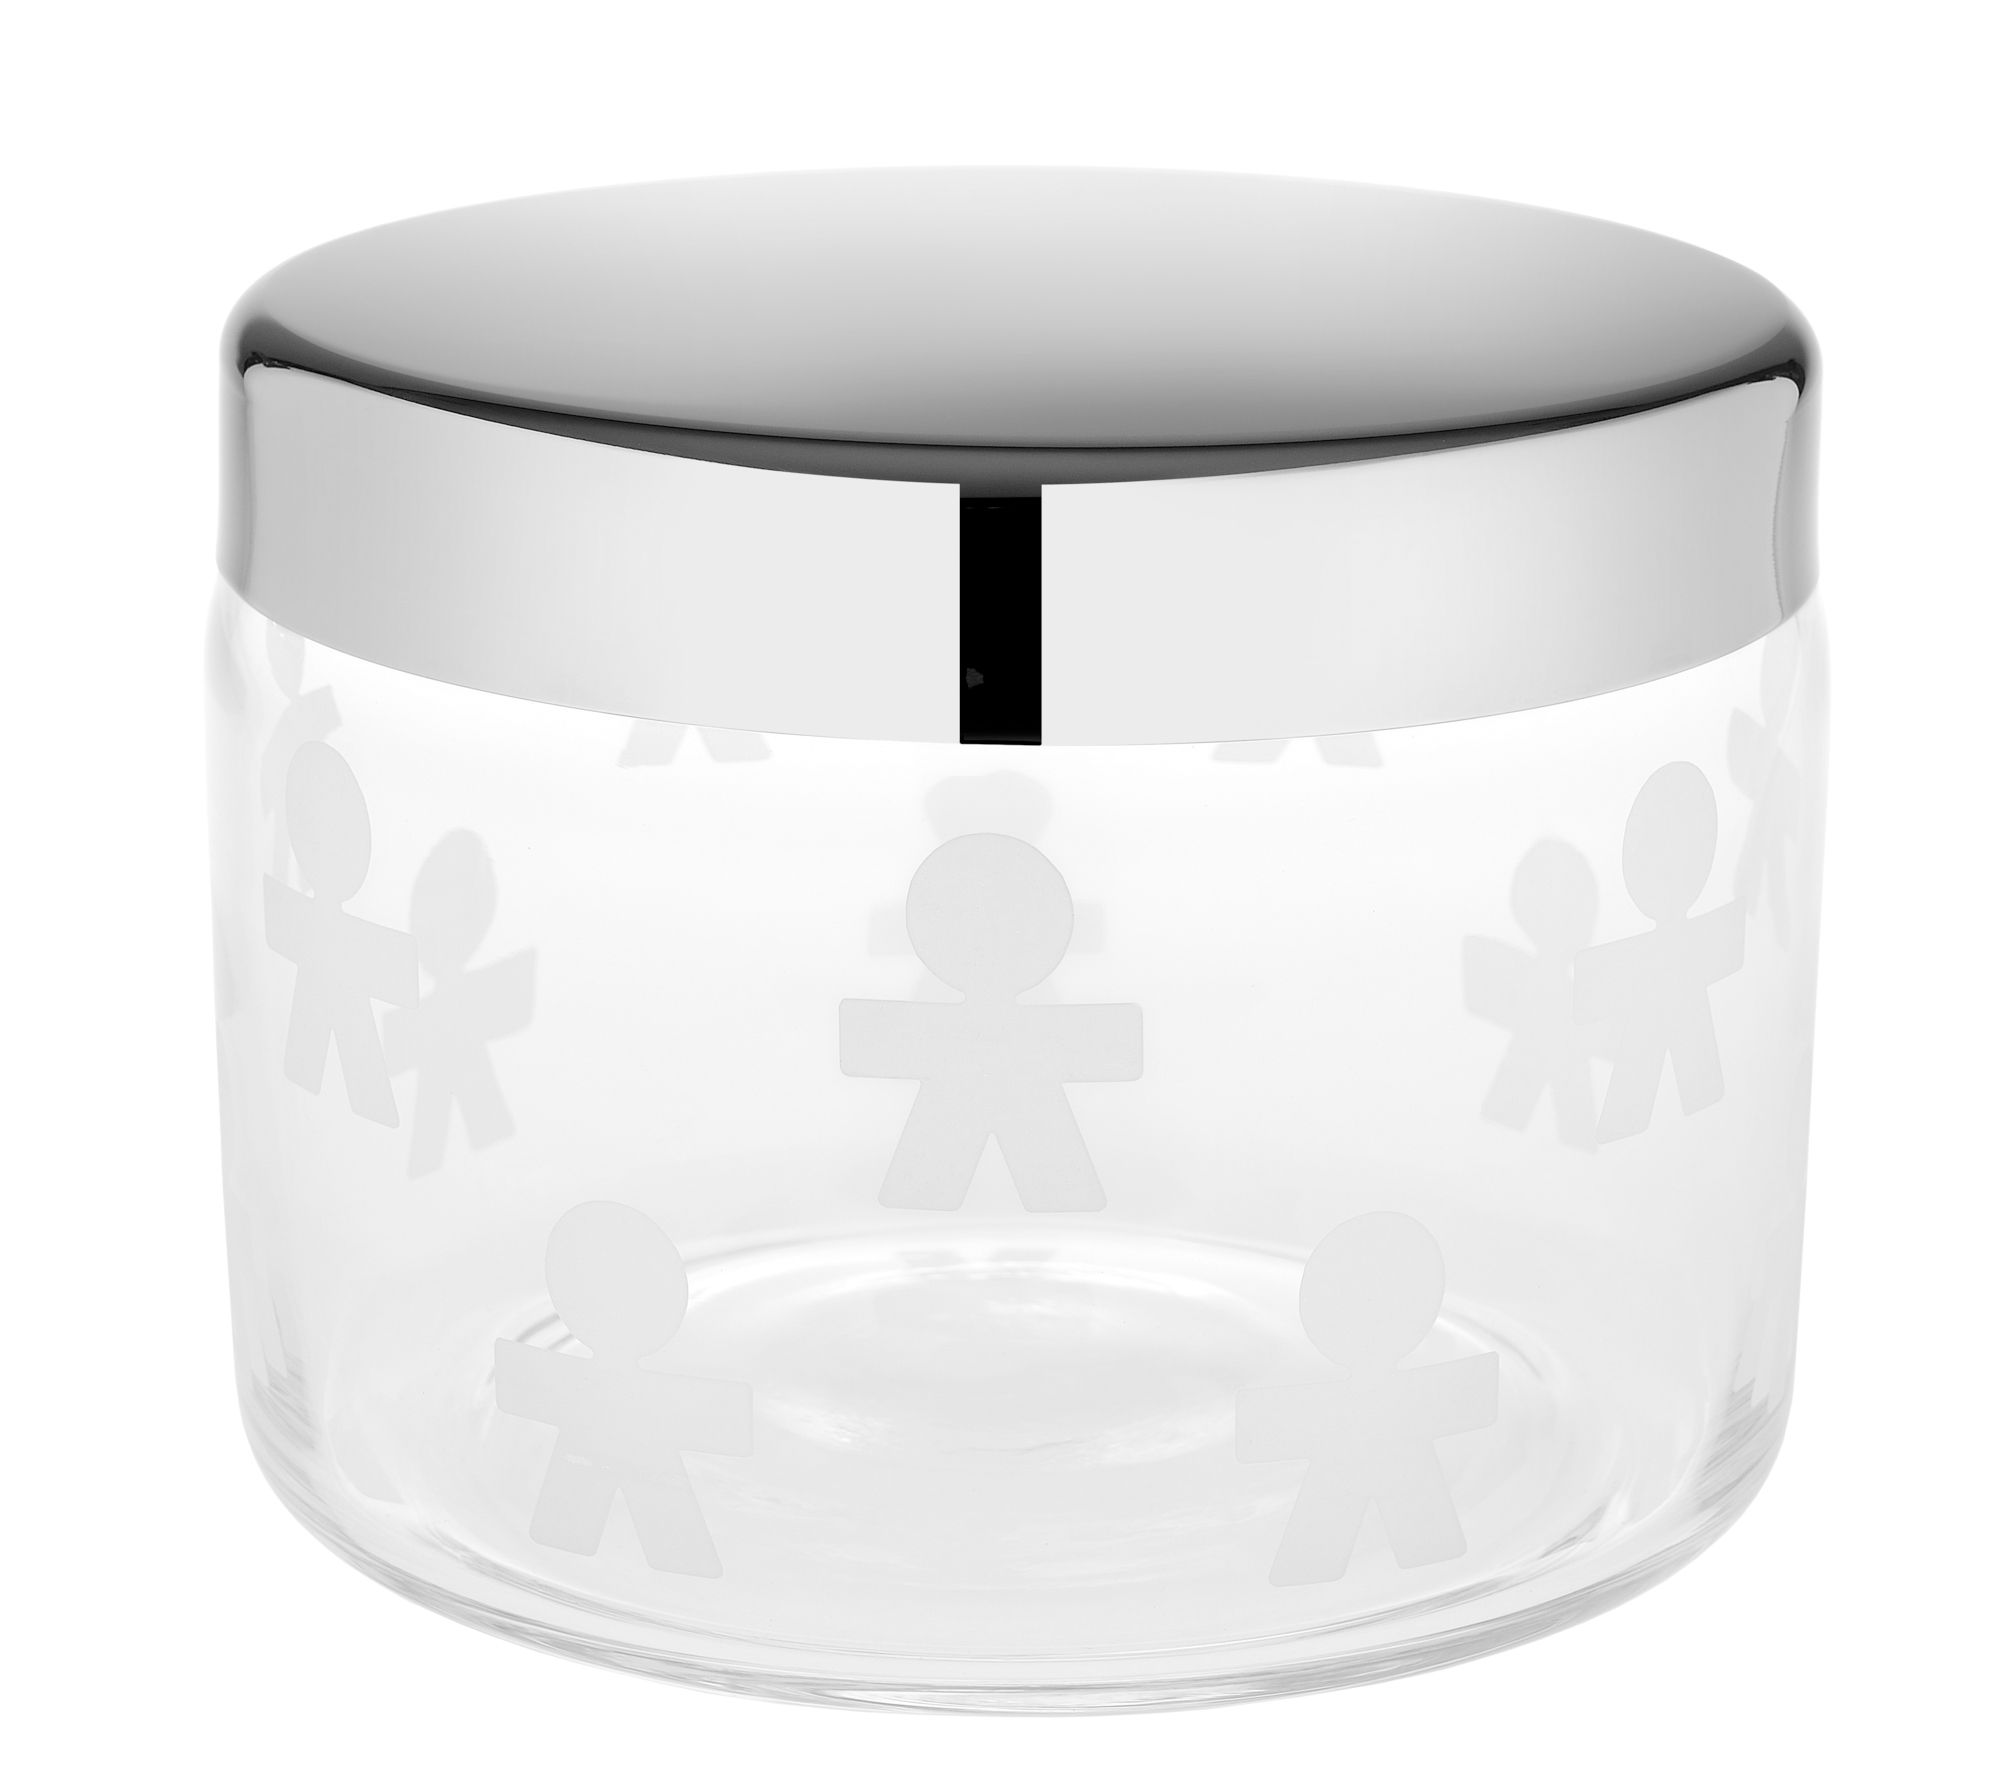 Kitchenware - Kitchen Storage Jars - Girotondo Biscuit tin by A di Alessi - Transparent / Steel lid - Stainless steel, Verre sérigraphié